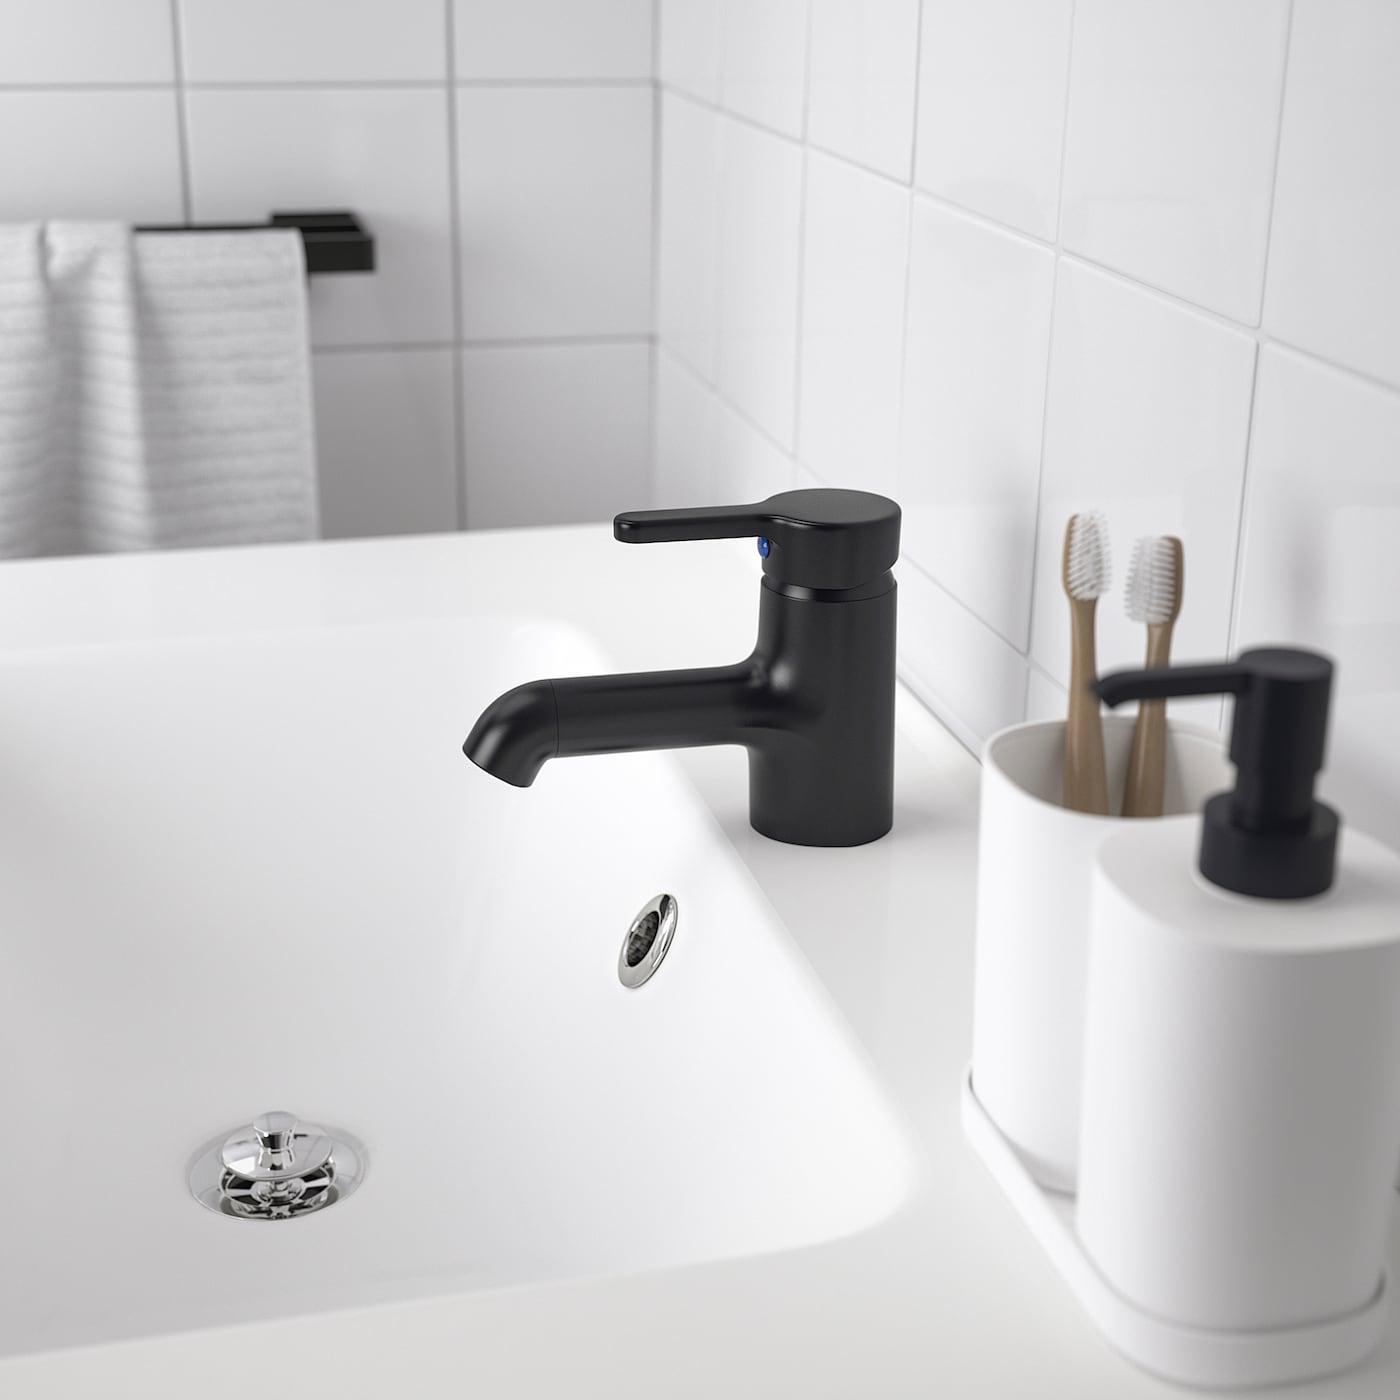 Saljen Bath Faucet Black Ikea